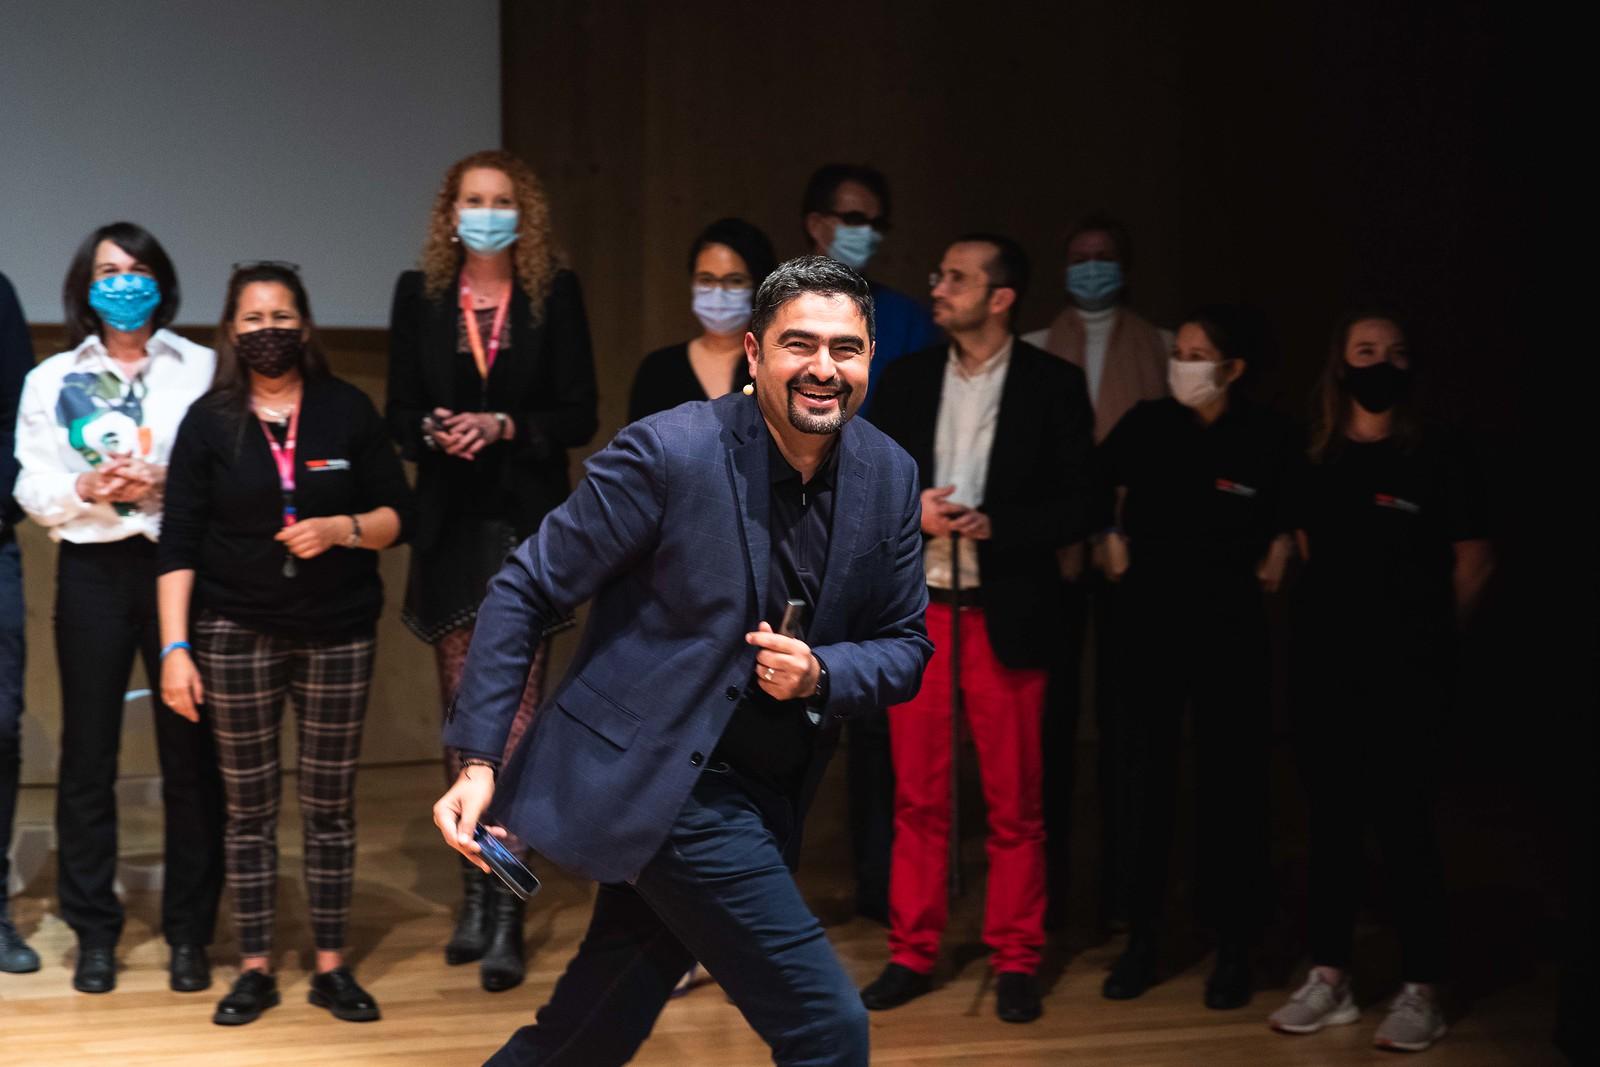 TEDxAlsace 2020 - VÉRITÉ ?